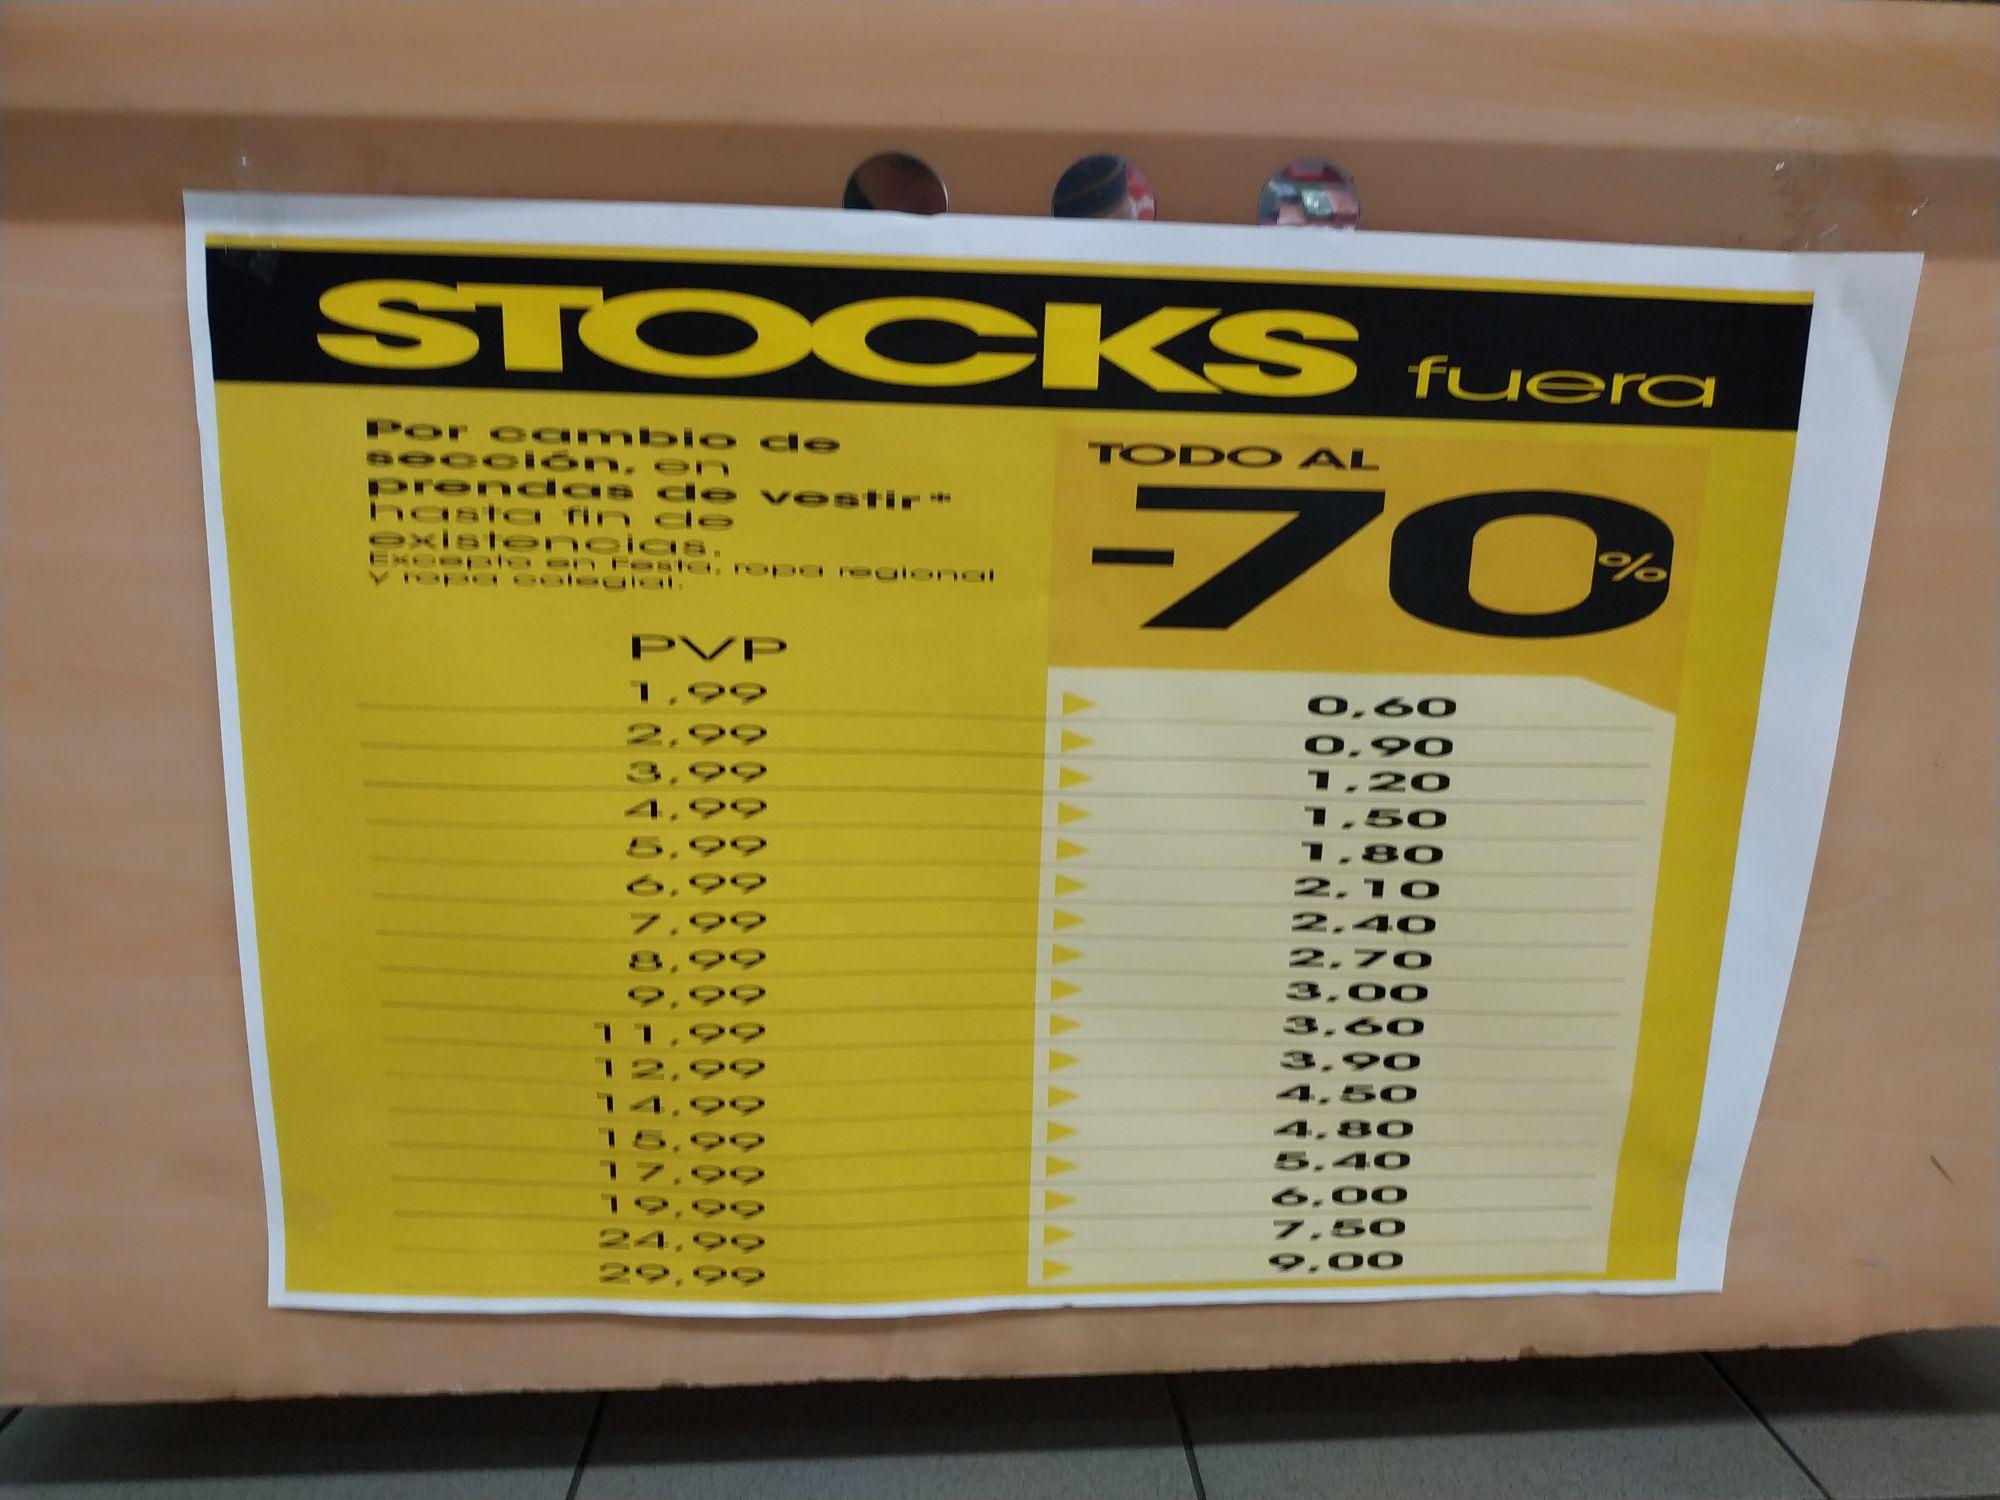 Ropa al 70% sobre precio ya rebajado en Eroski Max Center (Barakaldo)